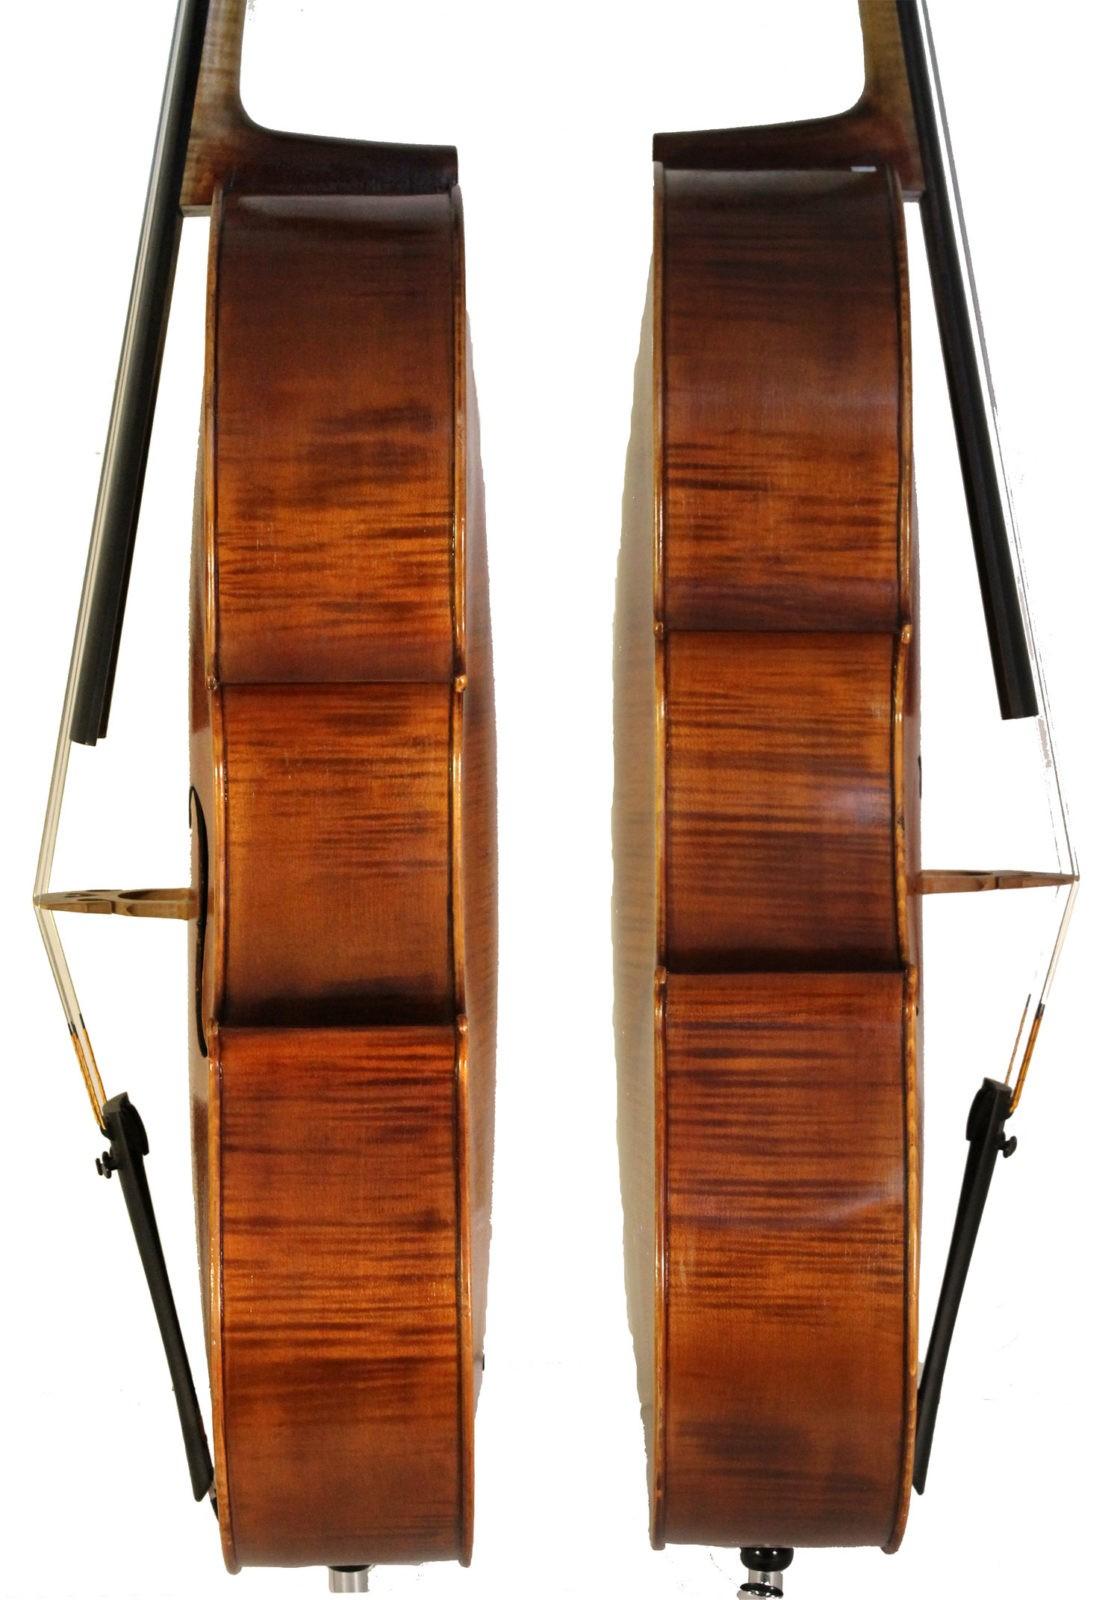 Gennaro De Luccia cello sides